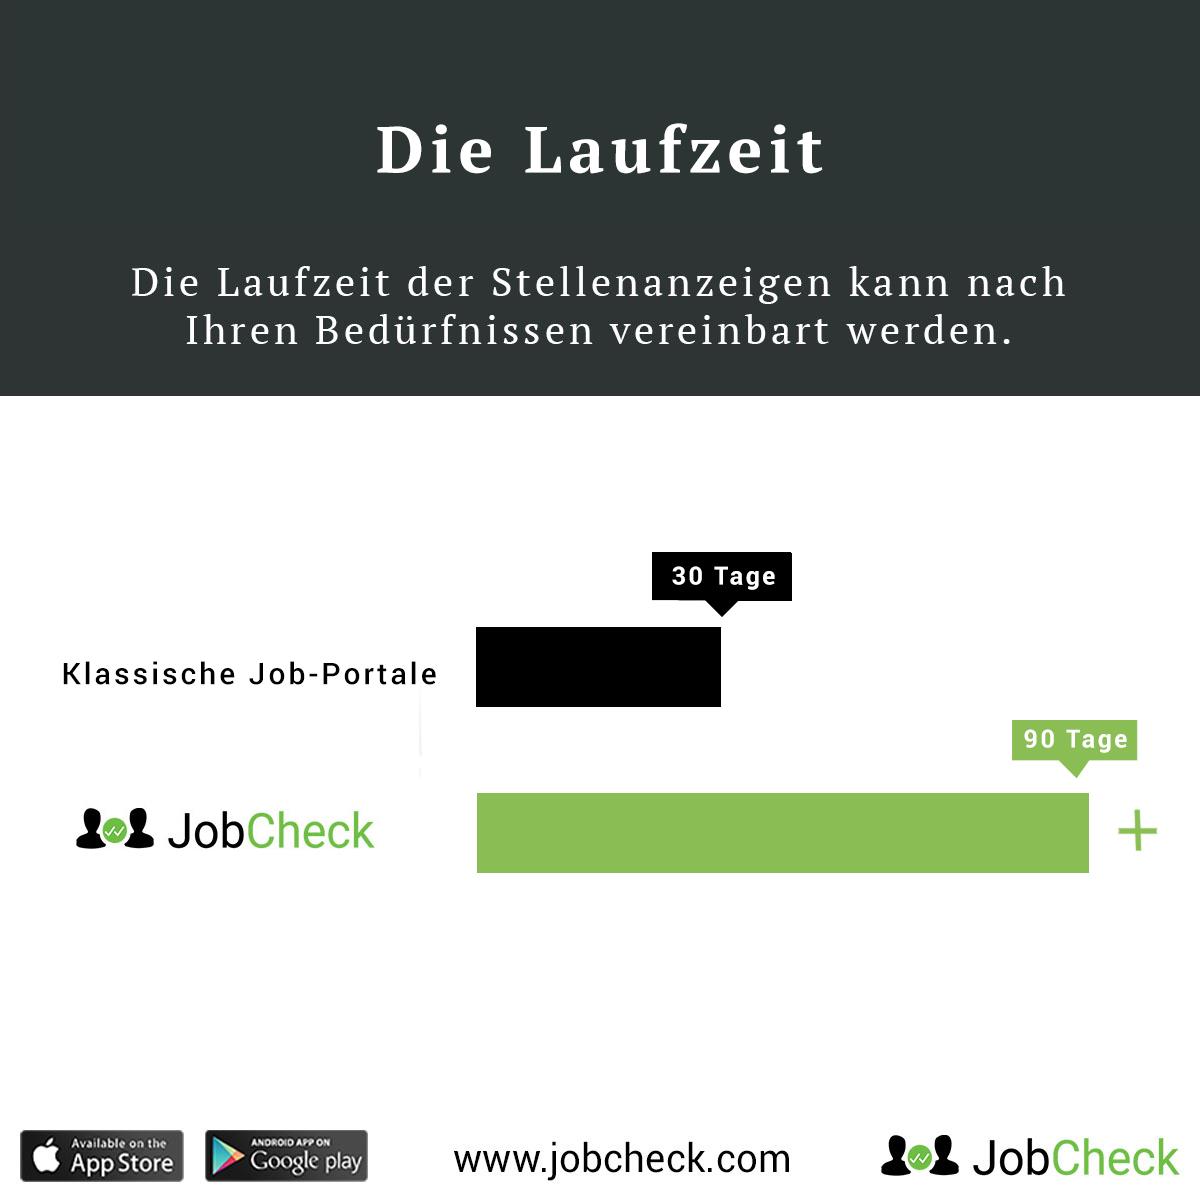 jobcheck-recruiting-laufzeit-vergleich